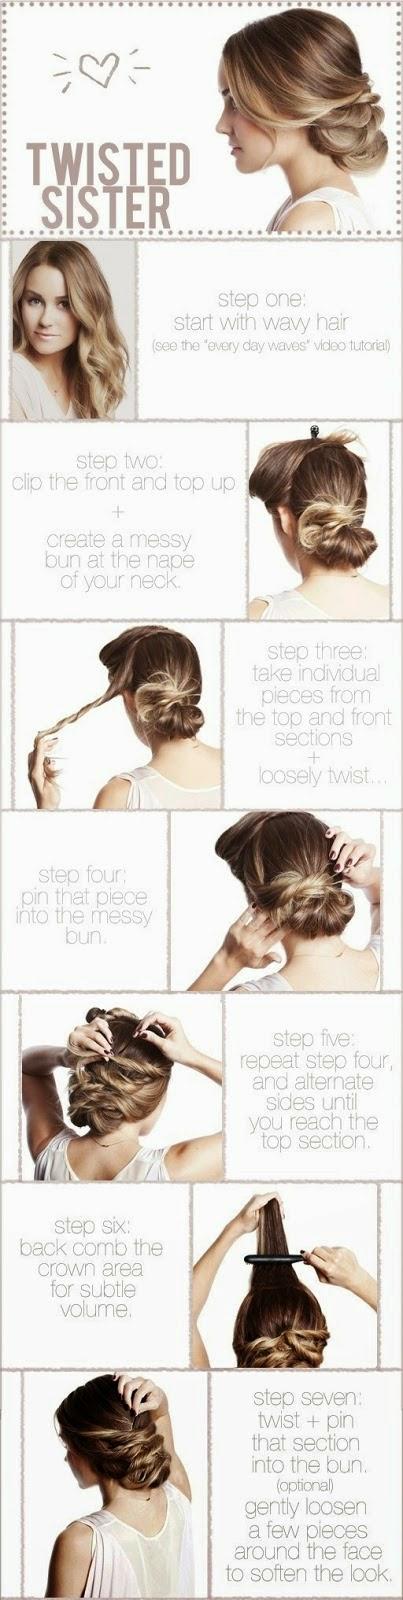 Cara mengikat rambut panjang yang cantik